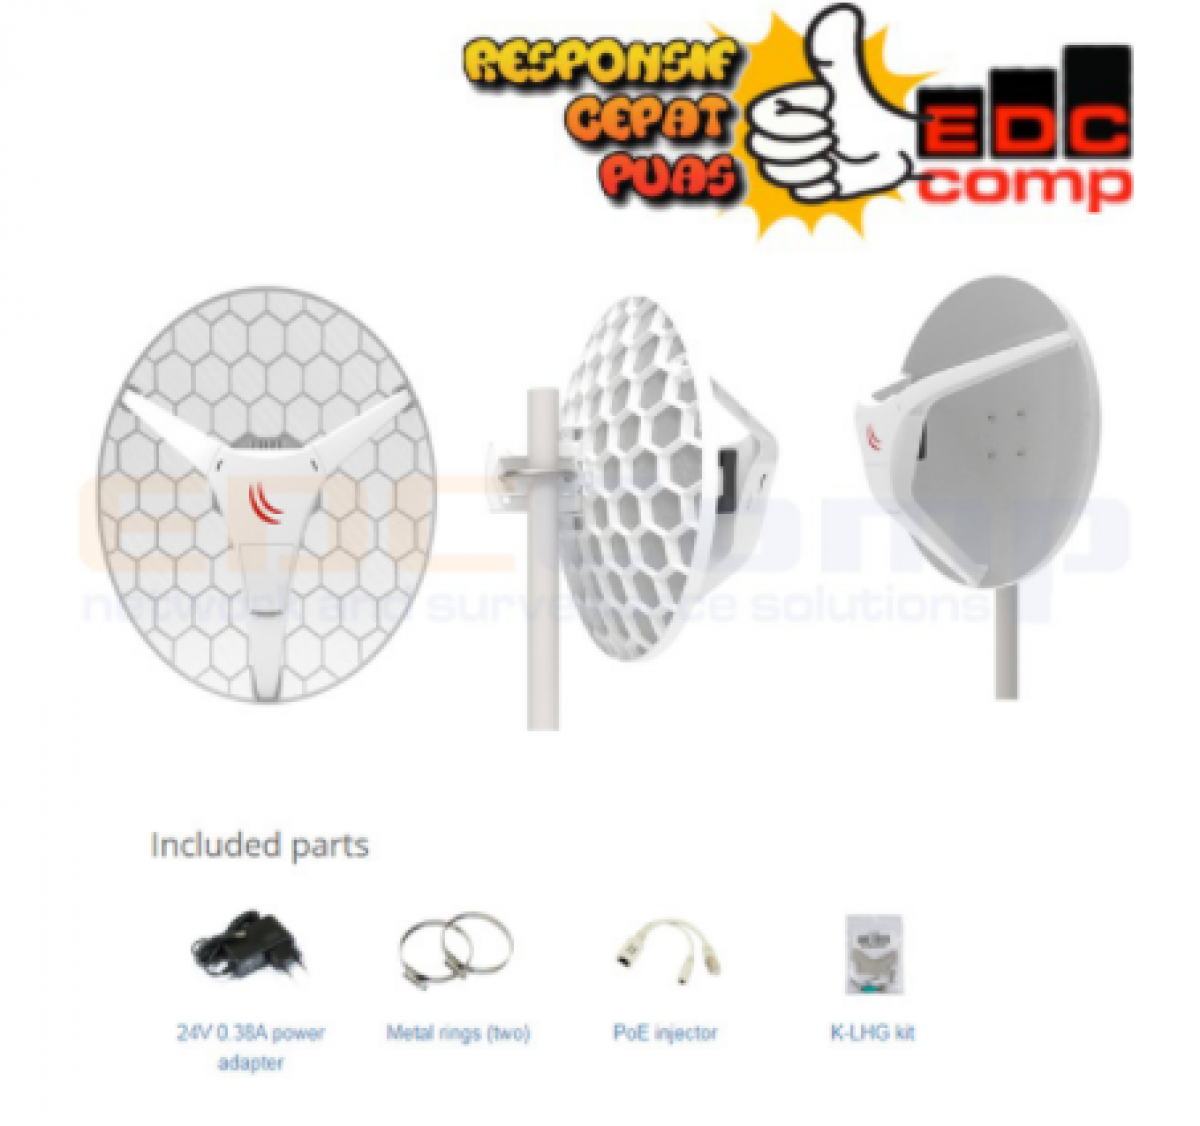 Mikrotik Wireless Wire Dish RBLHGG-60adkit - EdcComp